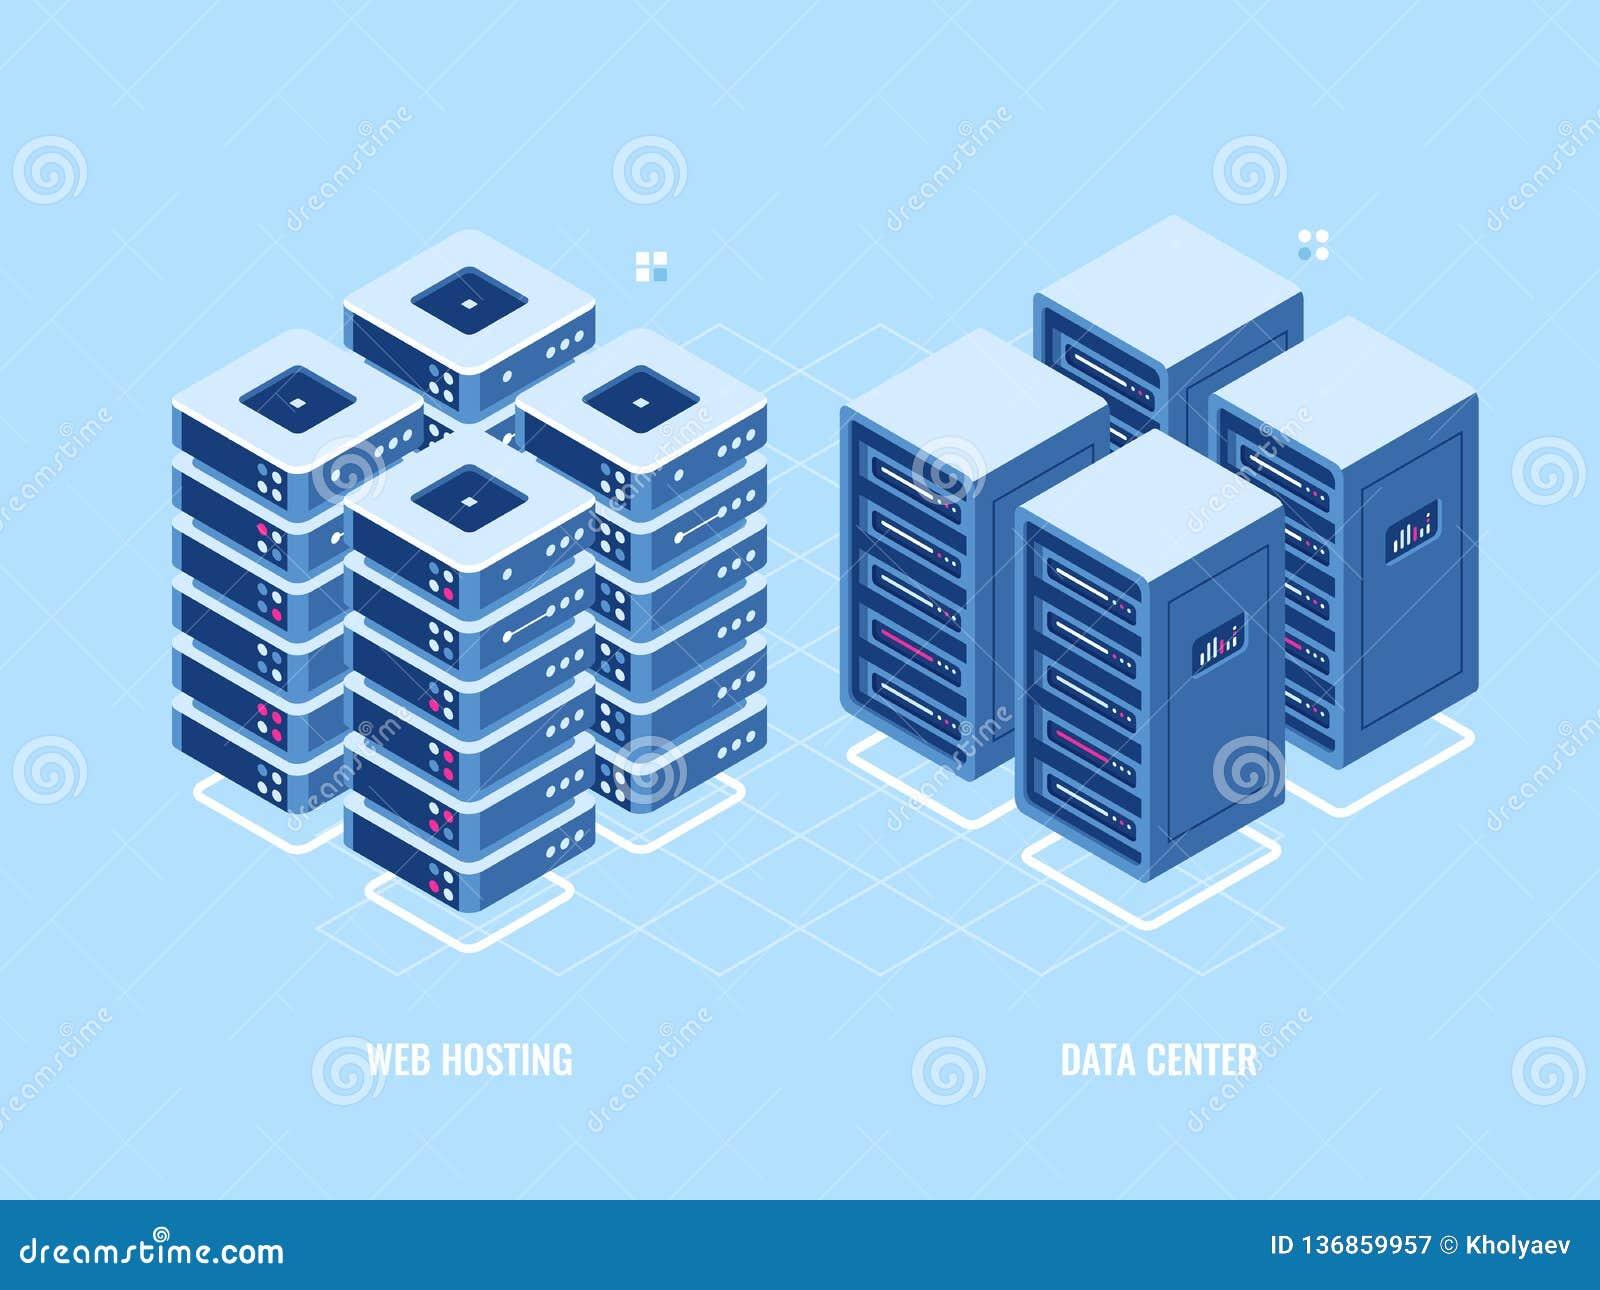 Web hosting server rack, isometric icon of database and data center, blockchain digital technology concept, cloud